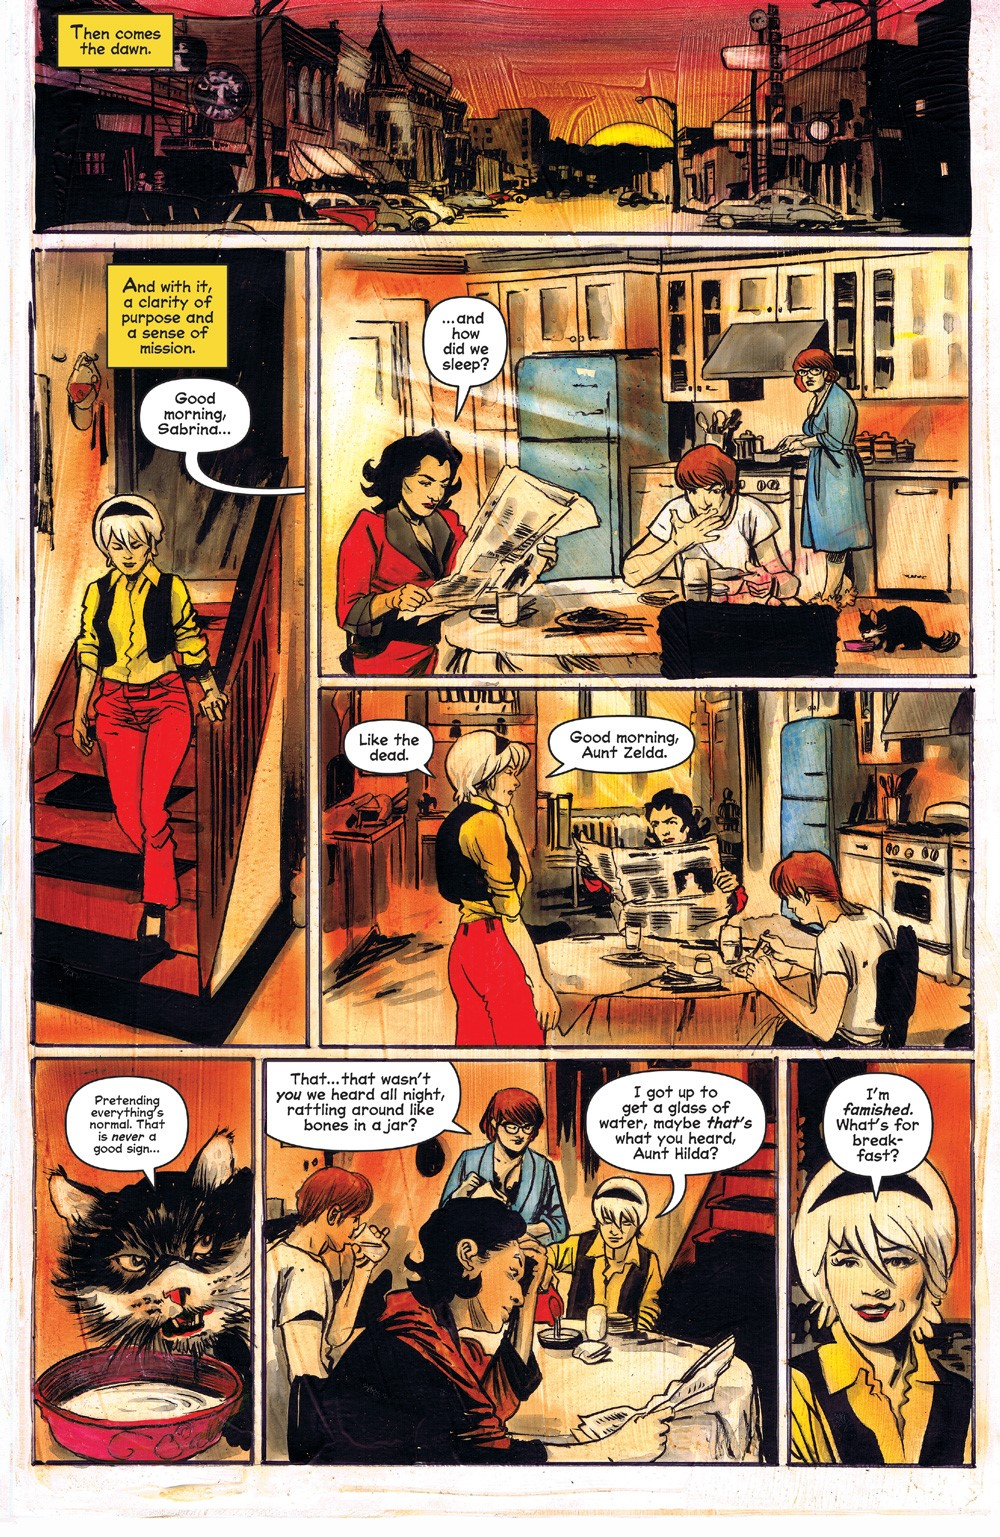 ChillingAdventuresOfSabrina_09-02 ComicList Previews: CHILLING ADVENTURES OF SABRINA #9